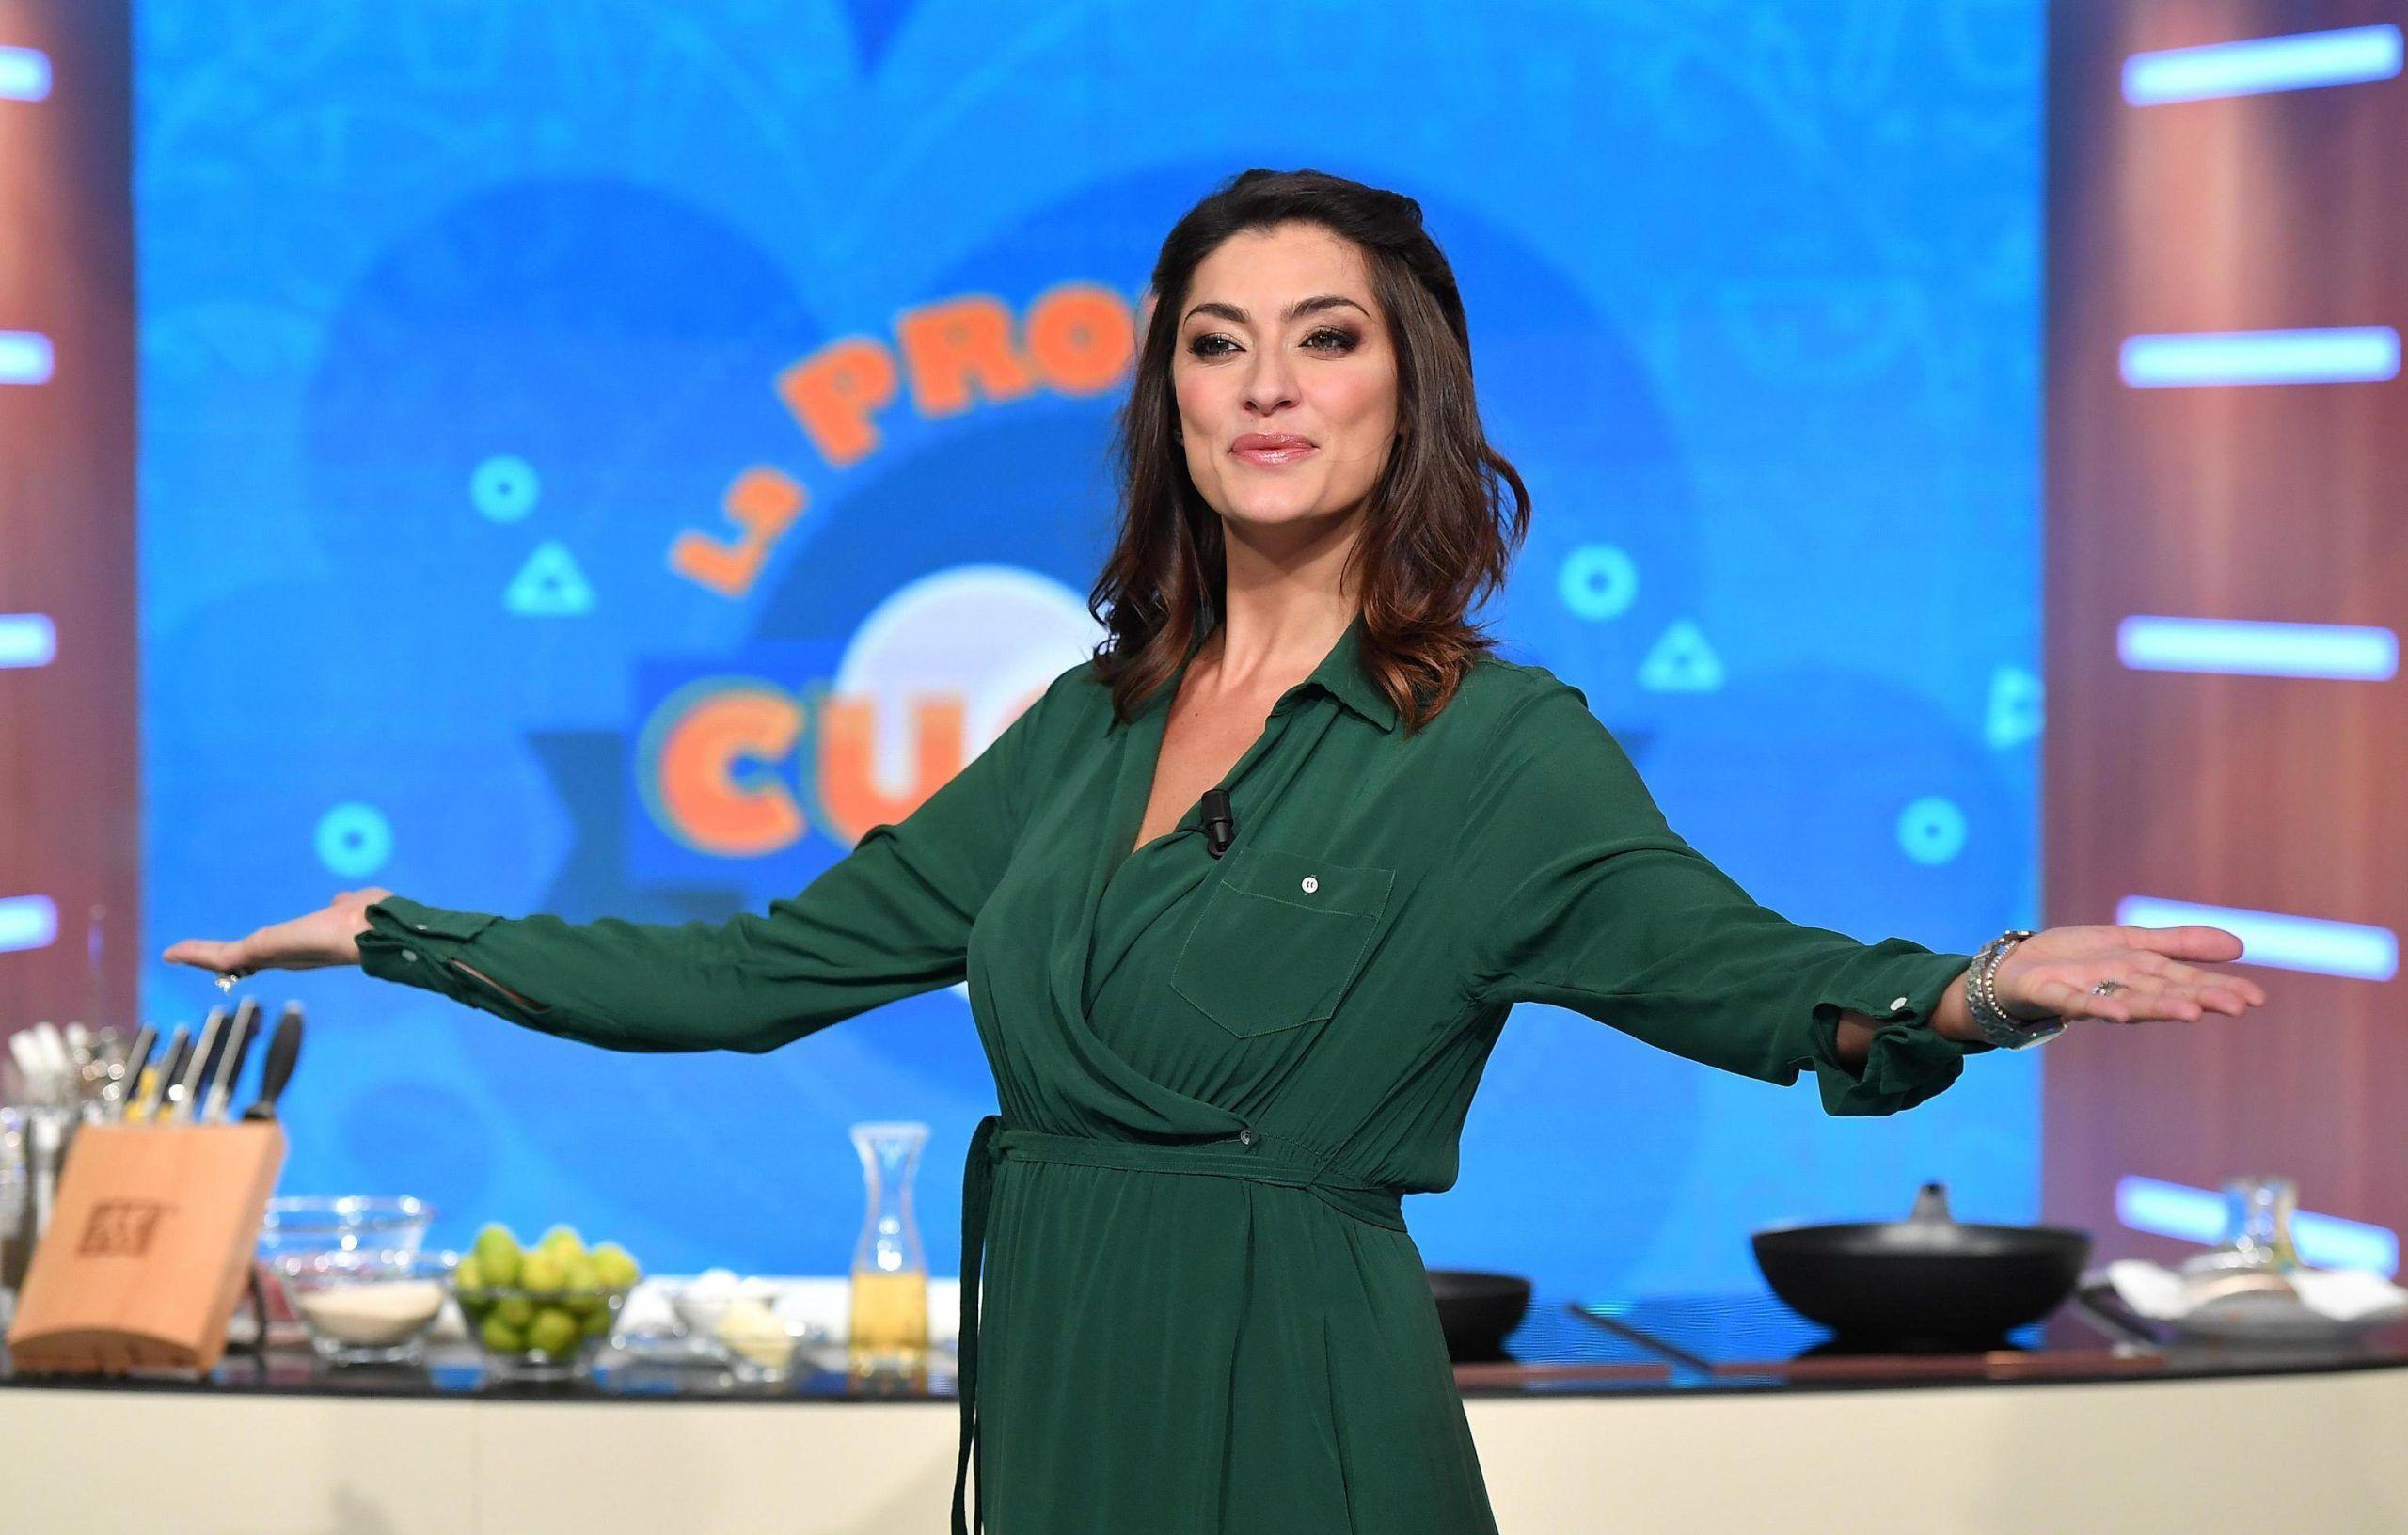 Elisa Isoardi: 'Antonella Clerici? Farò tesoro dei suoi suggerimenti, ma…'